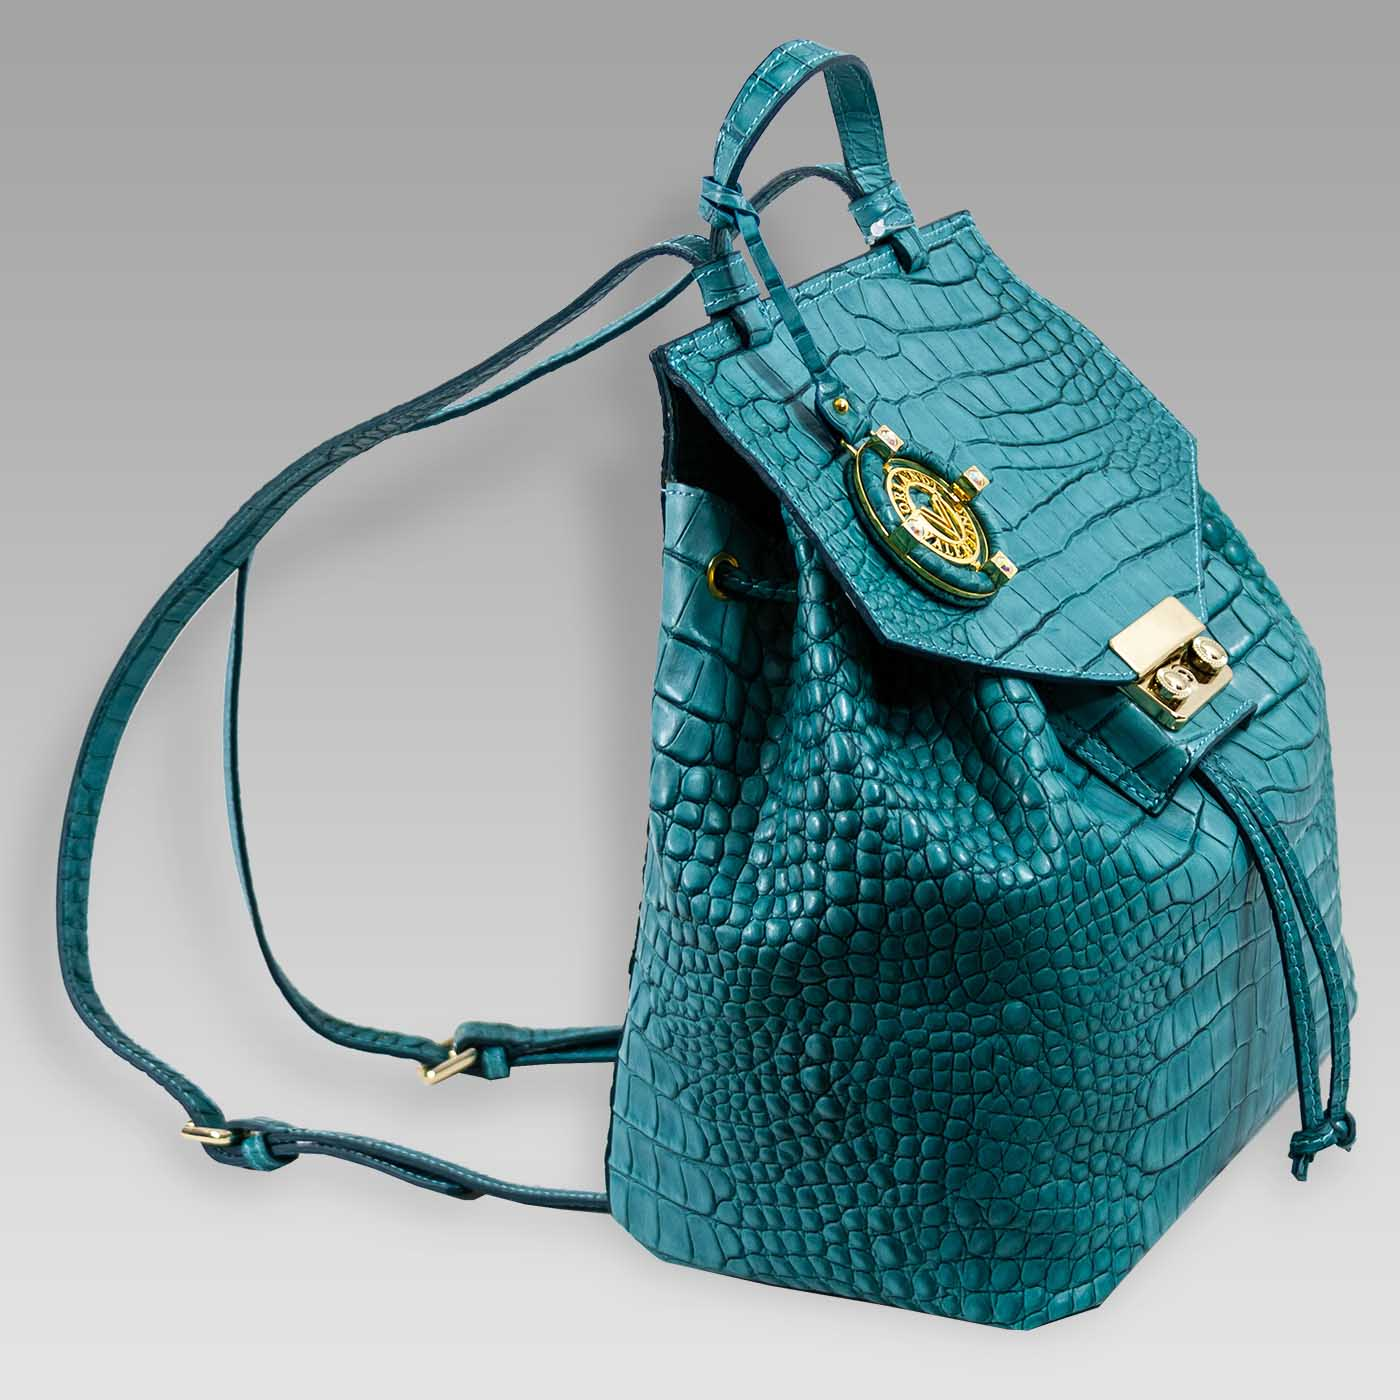 Valentino_Orlandi_Backpack_Deco_Blue_Croc_Embossed_Leather_Bucket_Bag_01VO41989CLAQ_02.jpg